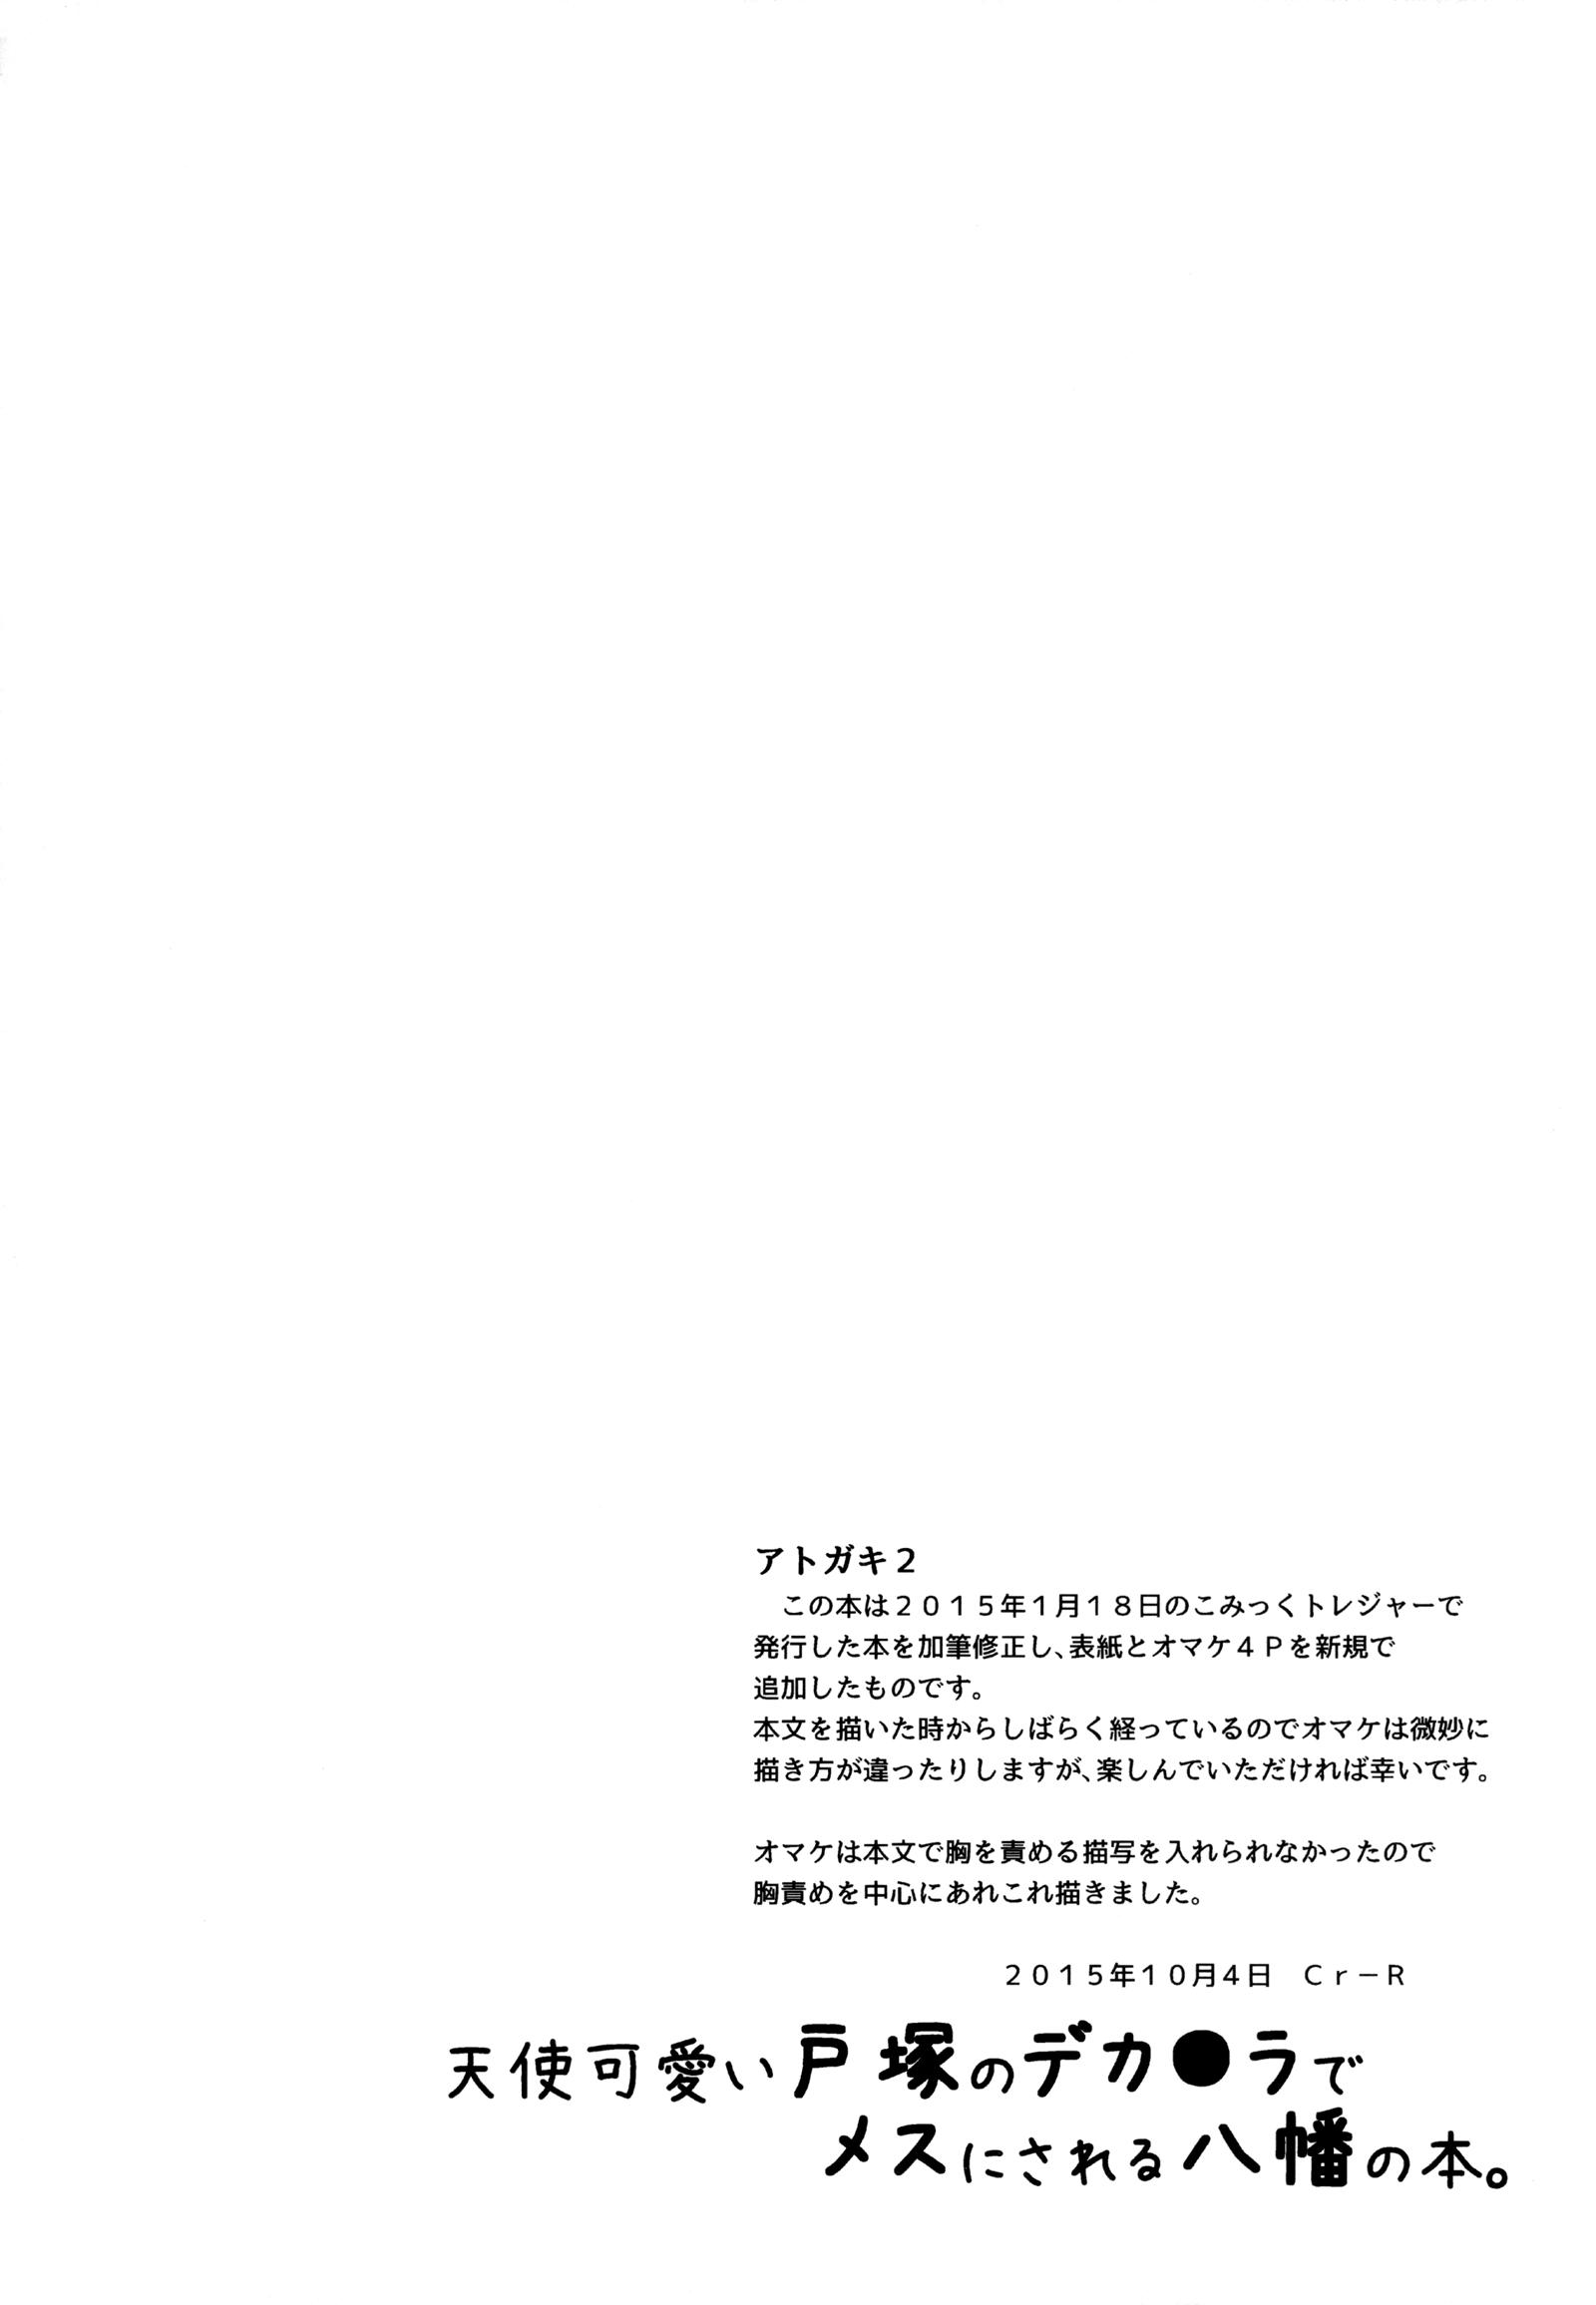 Tenshi Kawaii Totsuka no Dekamara de Mesu ni Sareru Hachiman no Hon. | Cute Angel Totsuka Turns Hachiman into His Bitch with His Elephant Cock 27